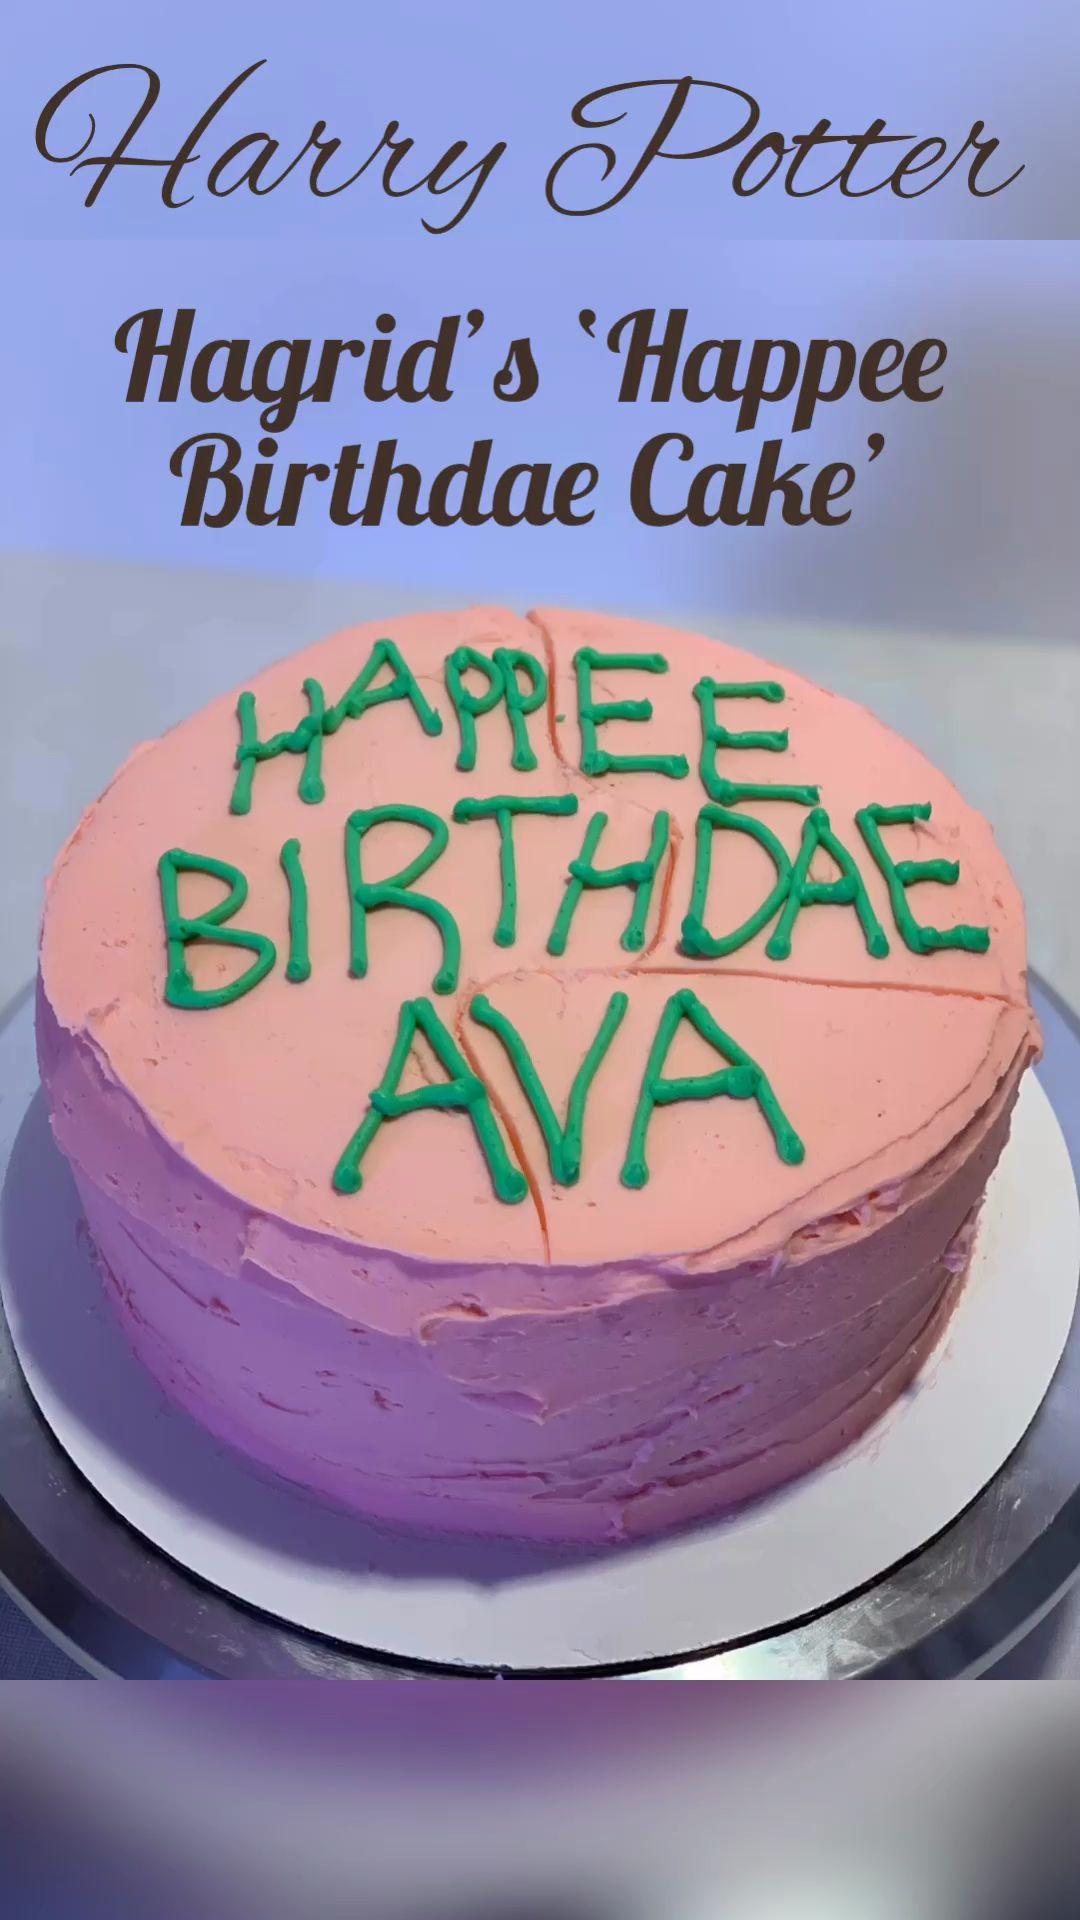 Harry Potter Happee Birthdae Cake Video Harry Potter Birthday Cake Harry Potter Cake Harry Potter Snacks